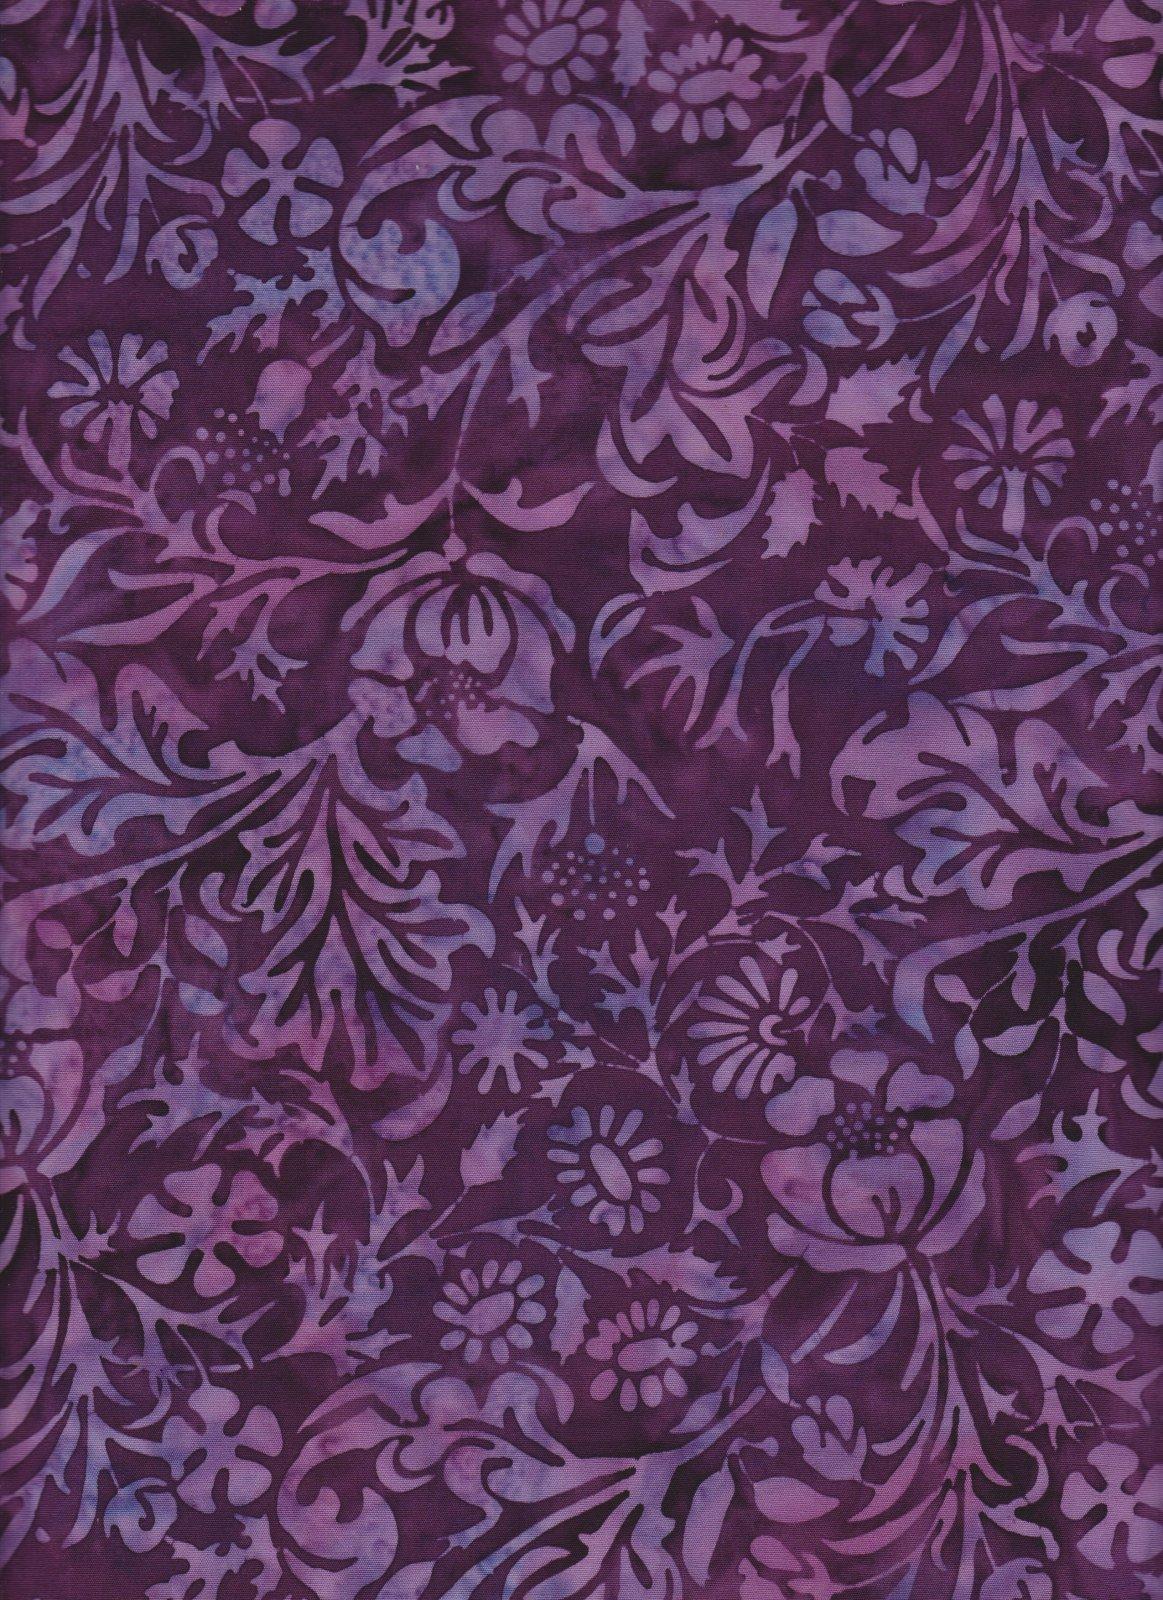 Island Batik - 111820490 - Cherwell/Vino/Eclectic